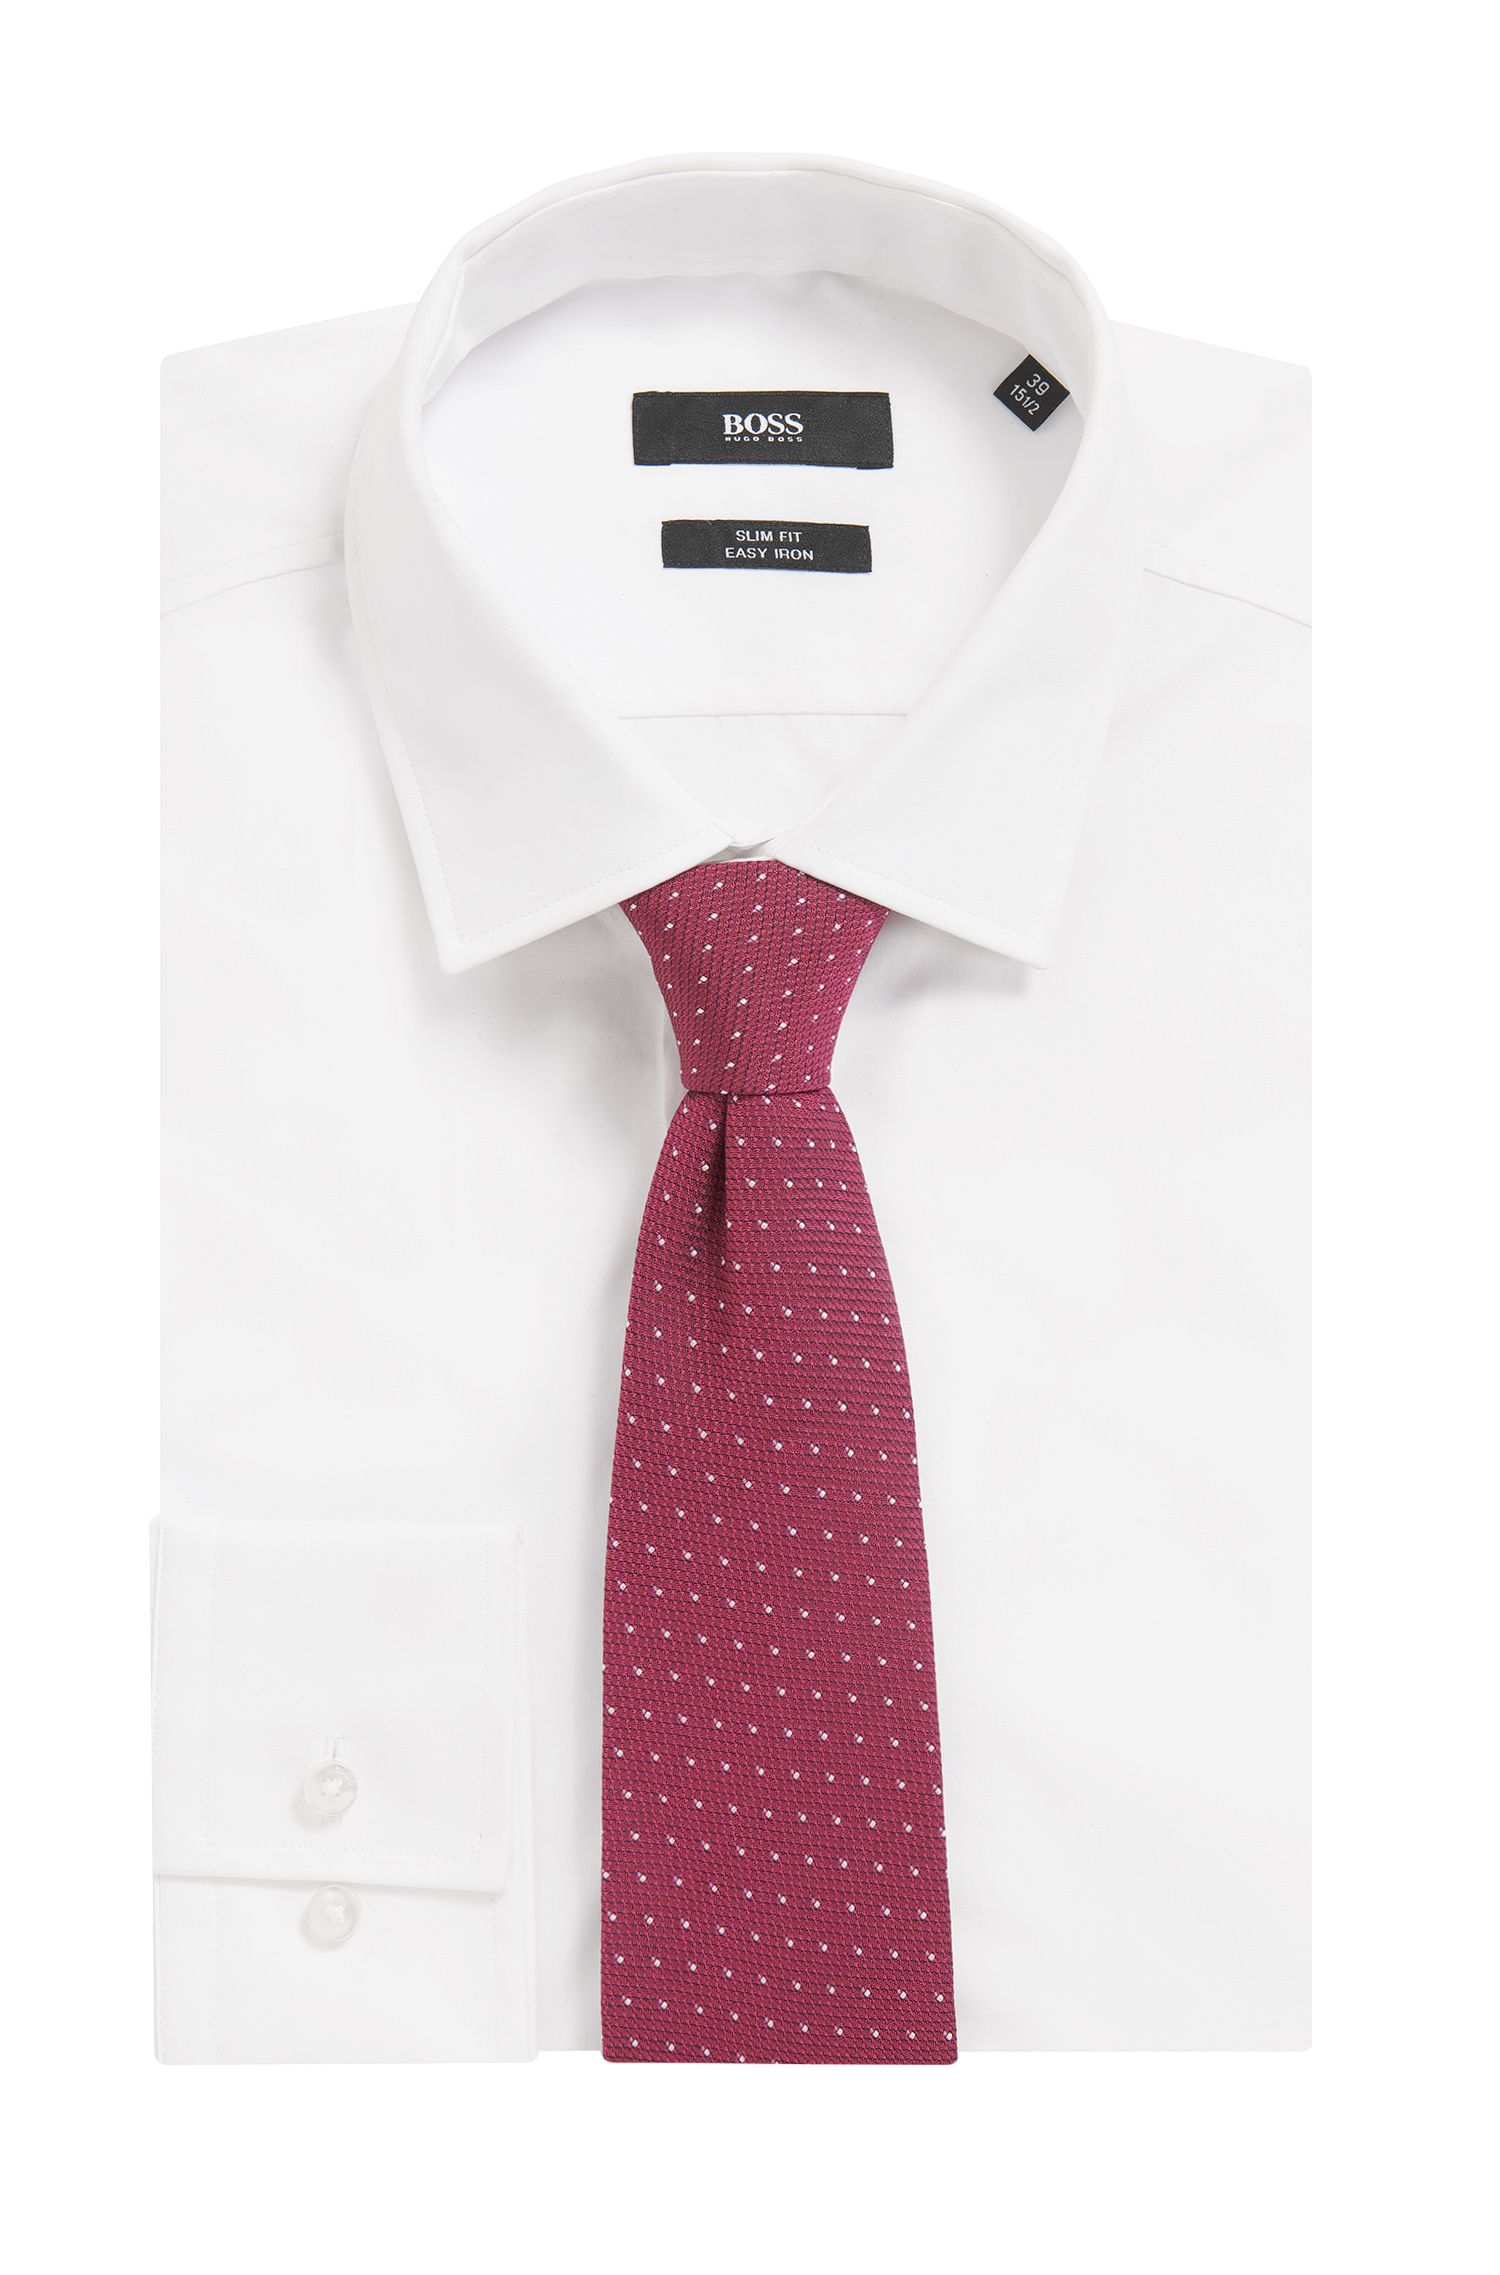 Patterned Jacquard Italian Silk Tie